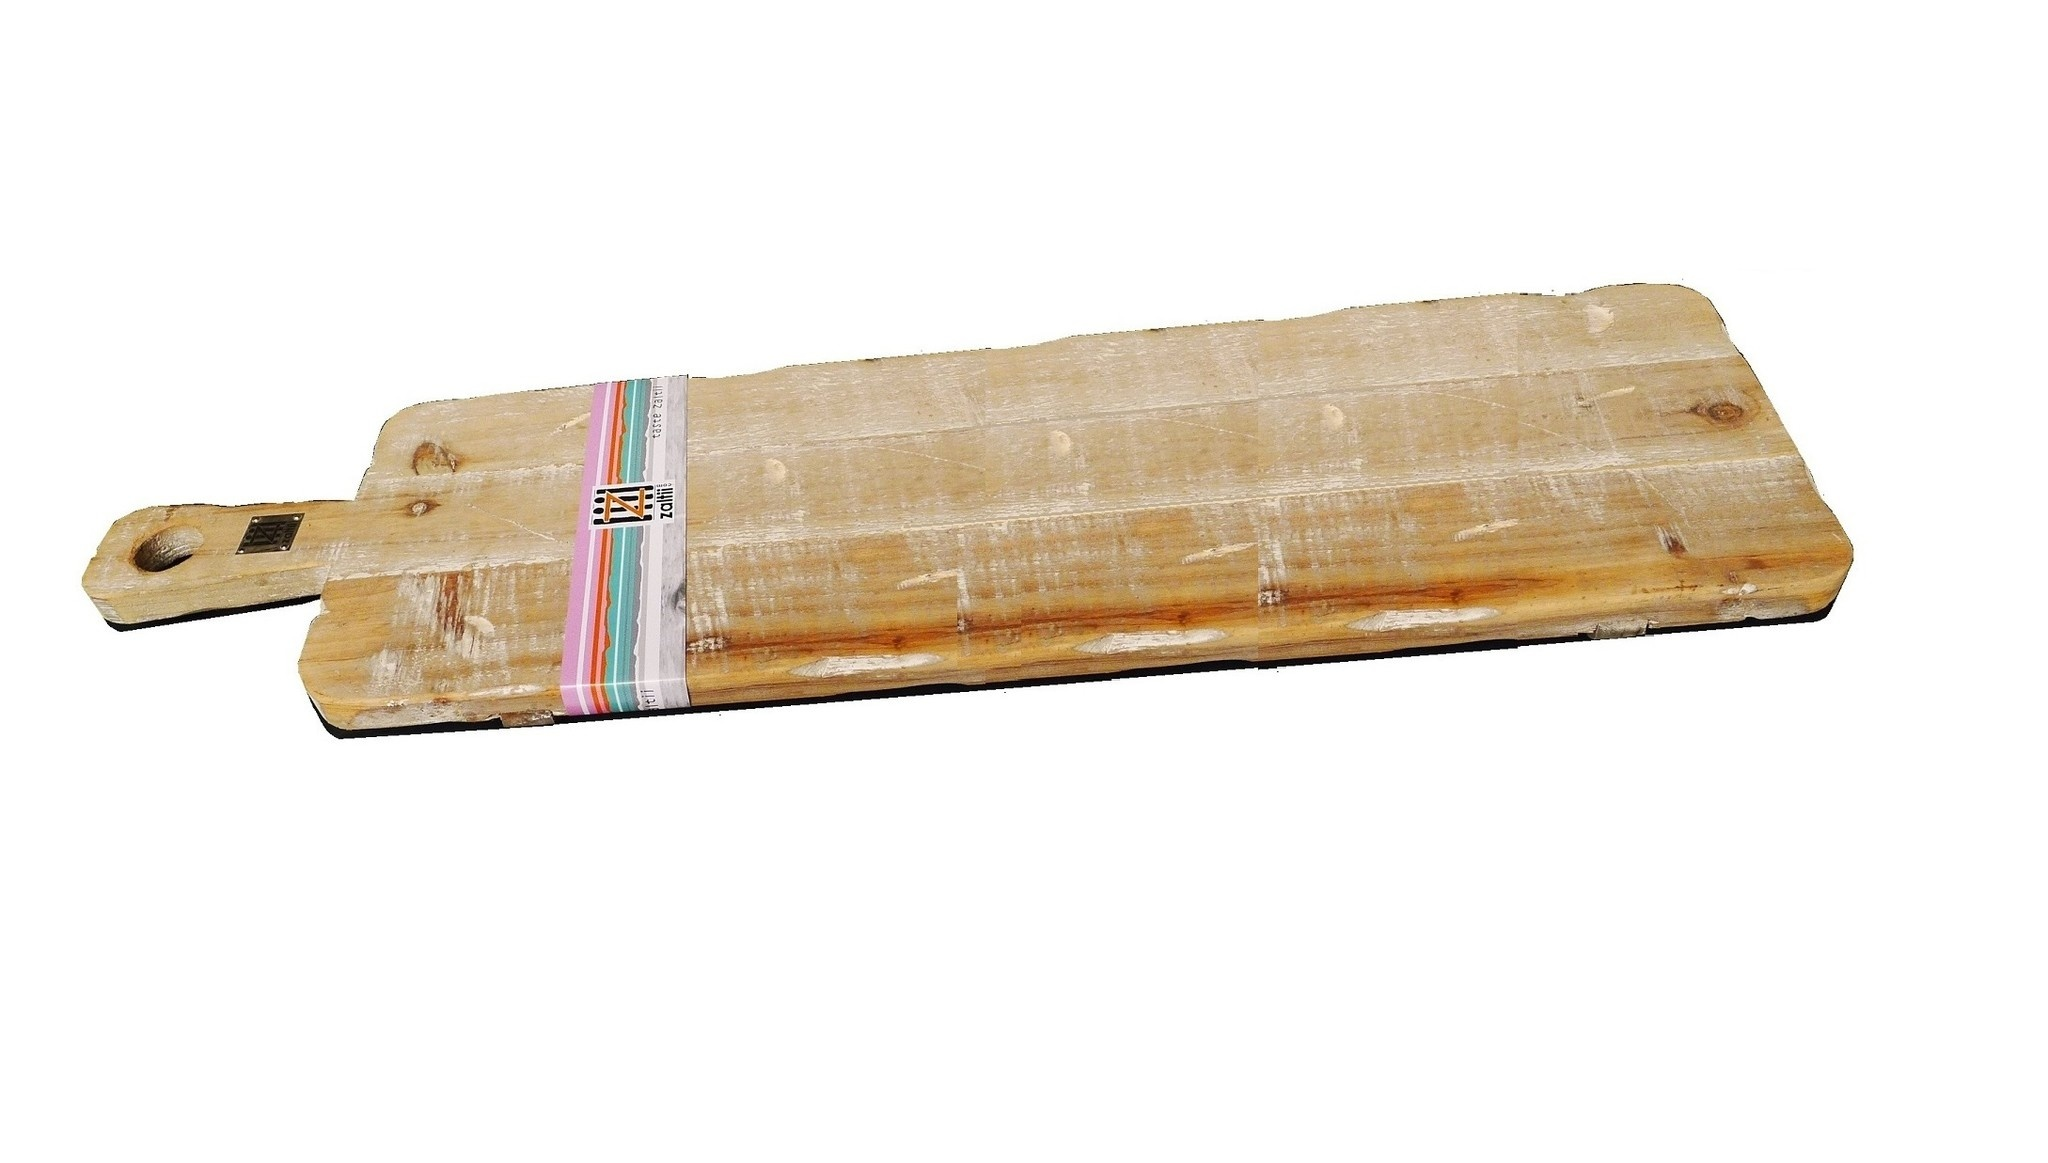 trayold dutchcutting blade 66/20-4